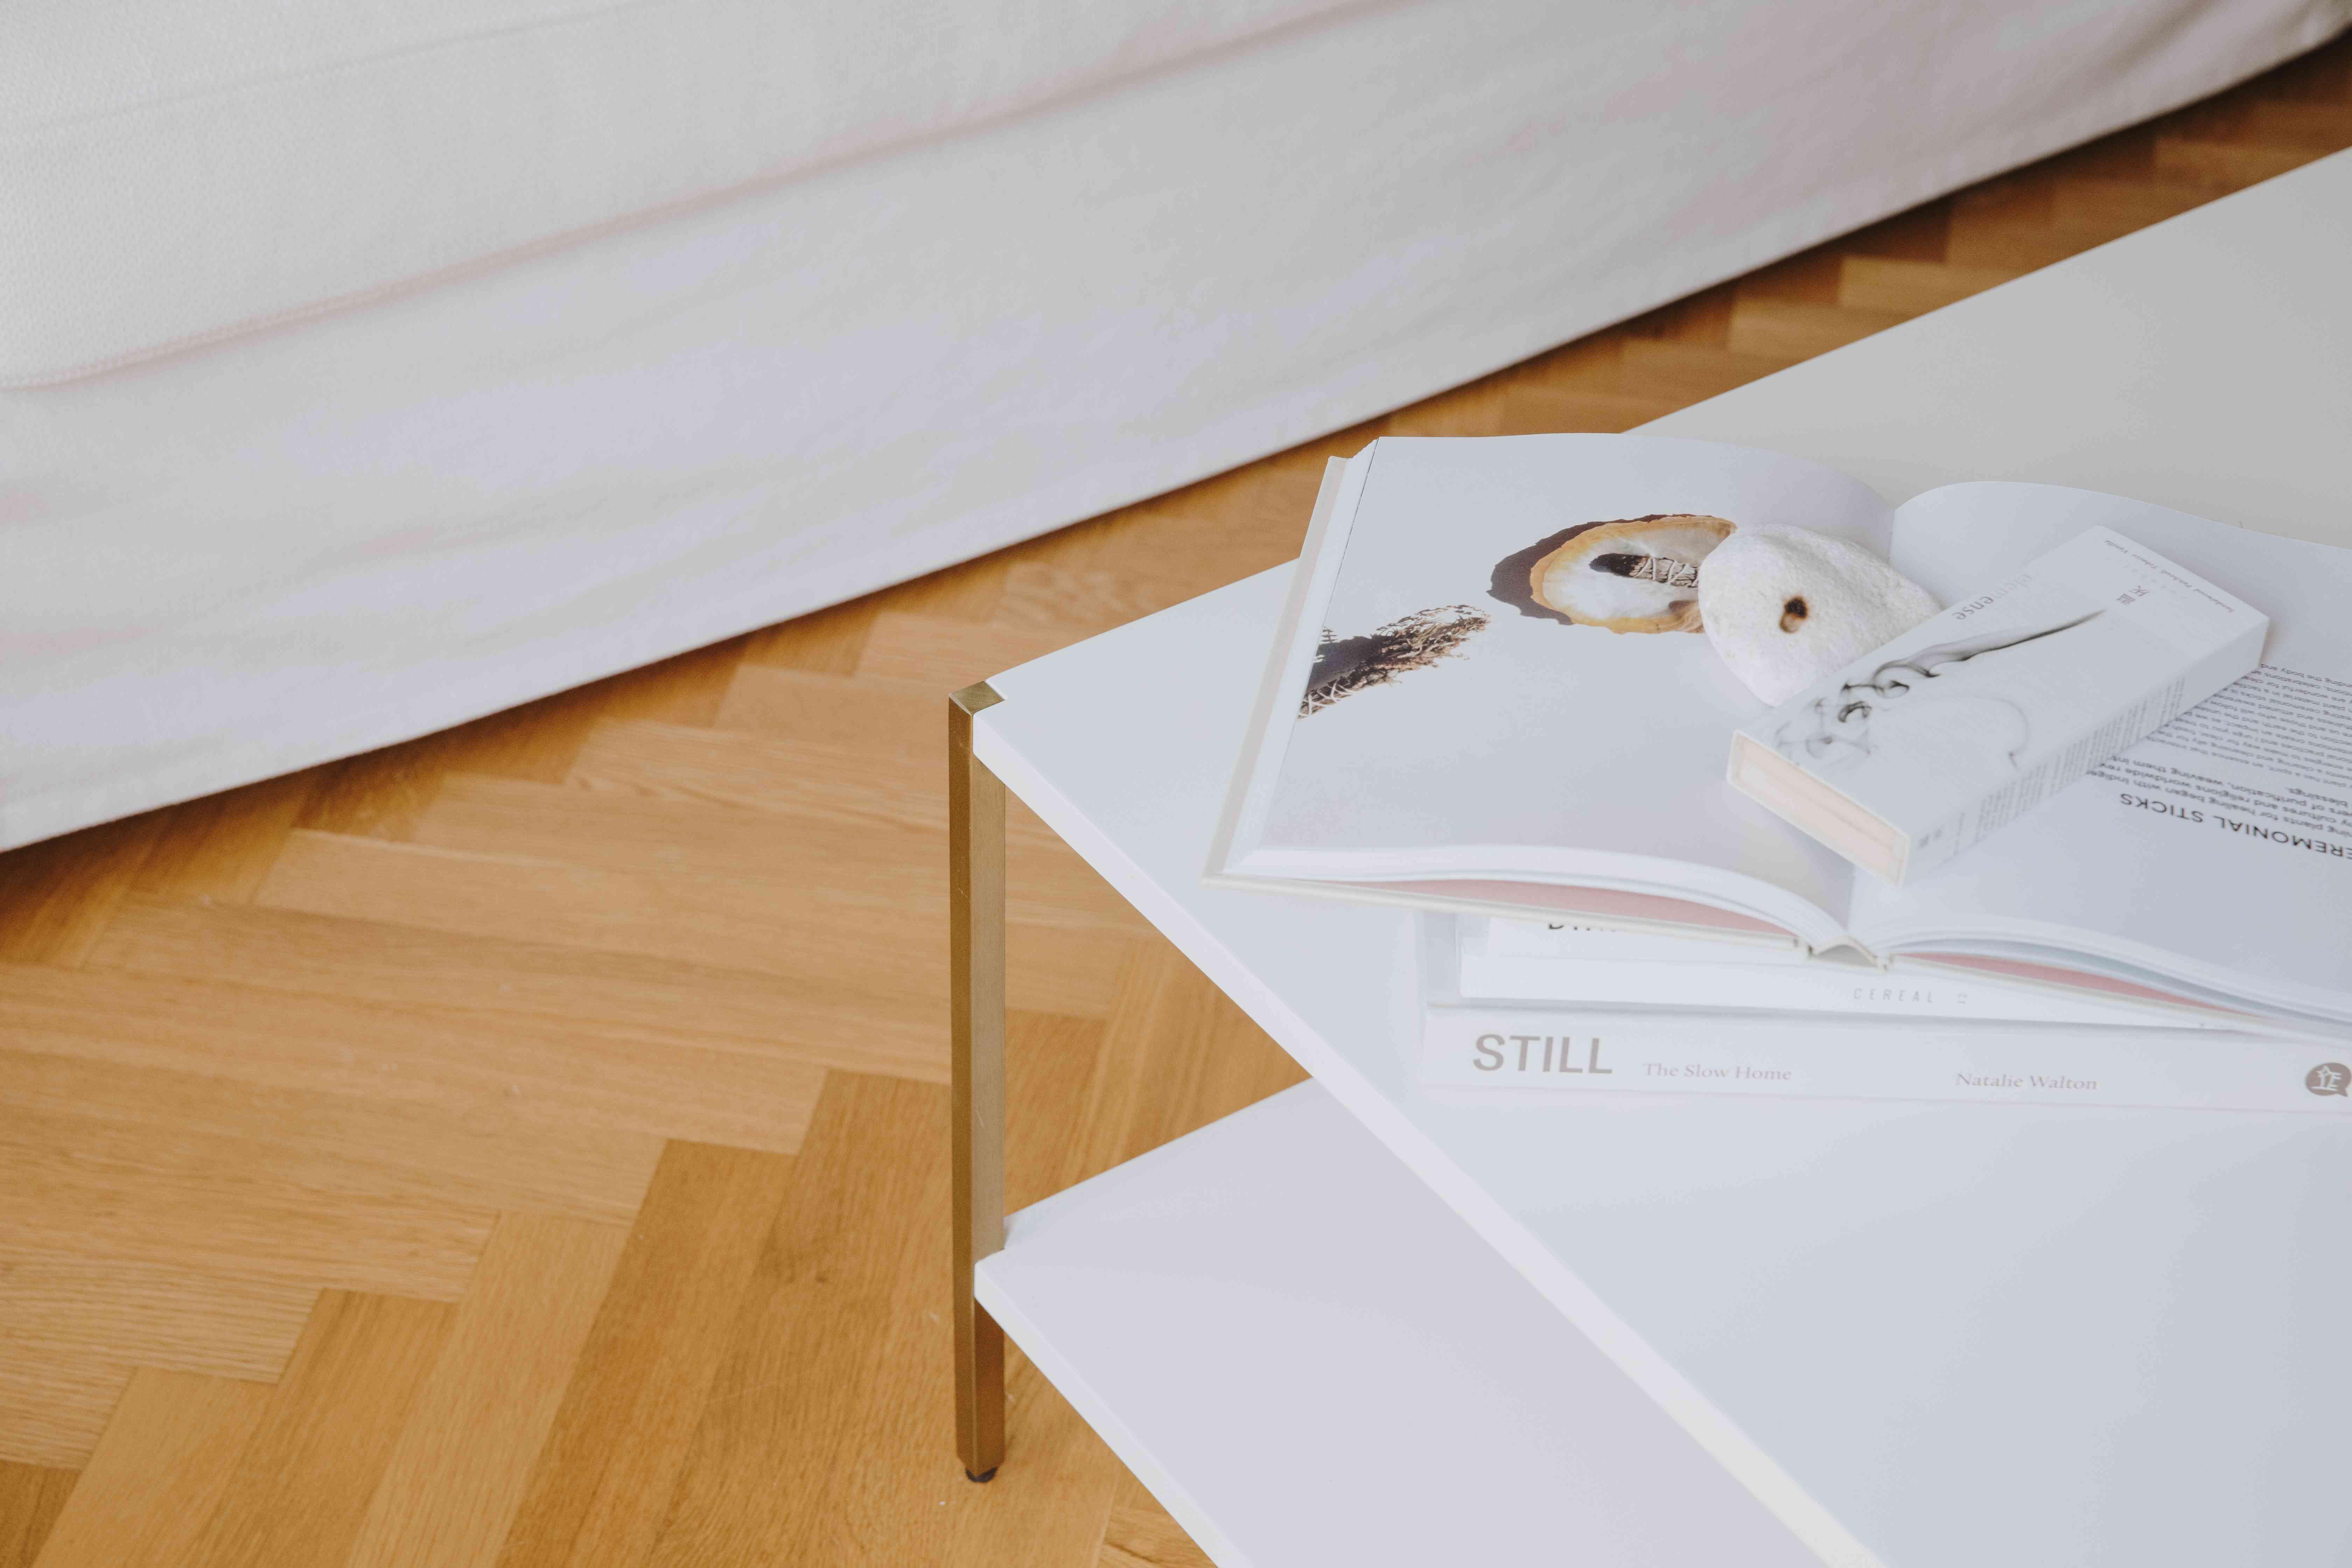 coffee table with metallic legs